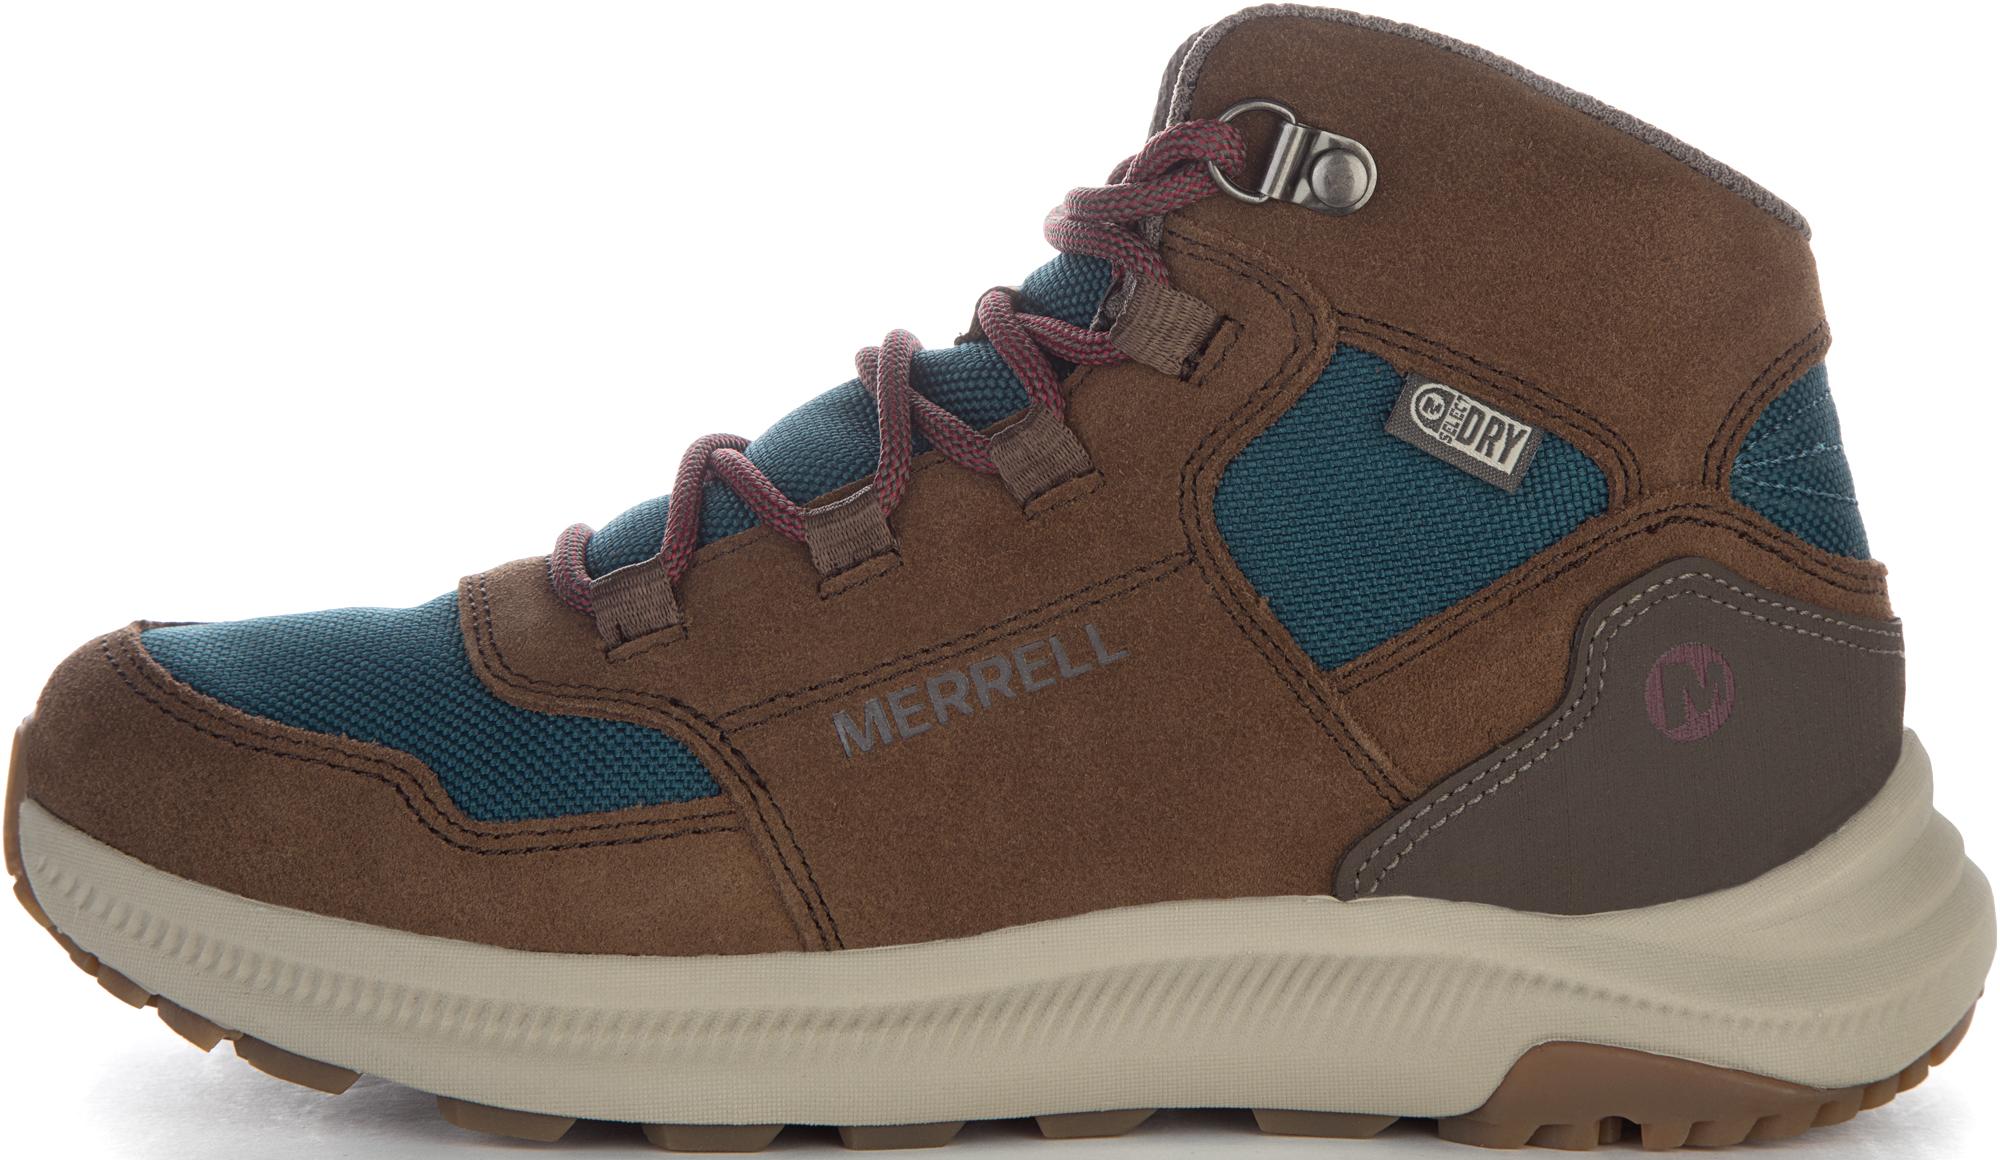 Merrell Ботинки для мальчиков Merrell, размер 34,5